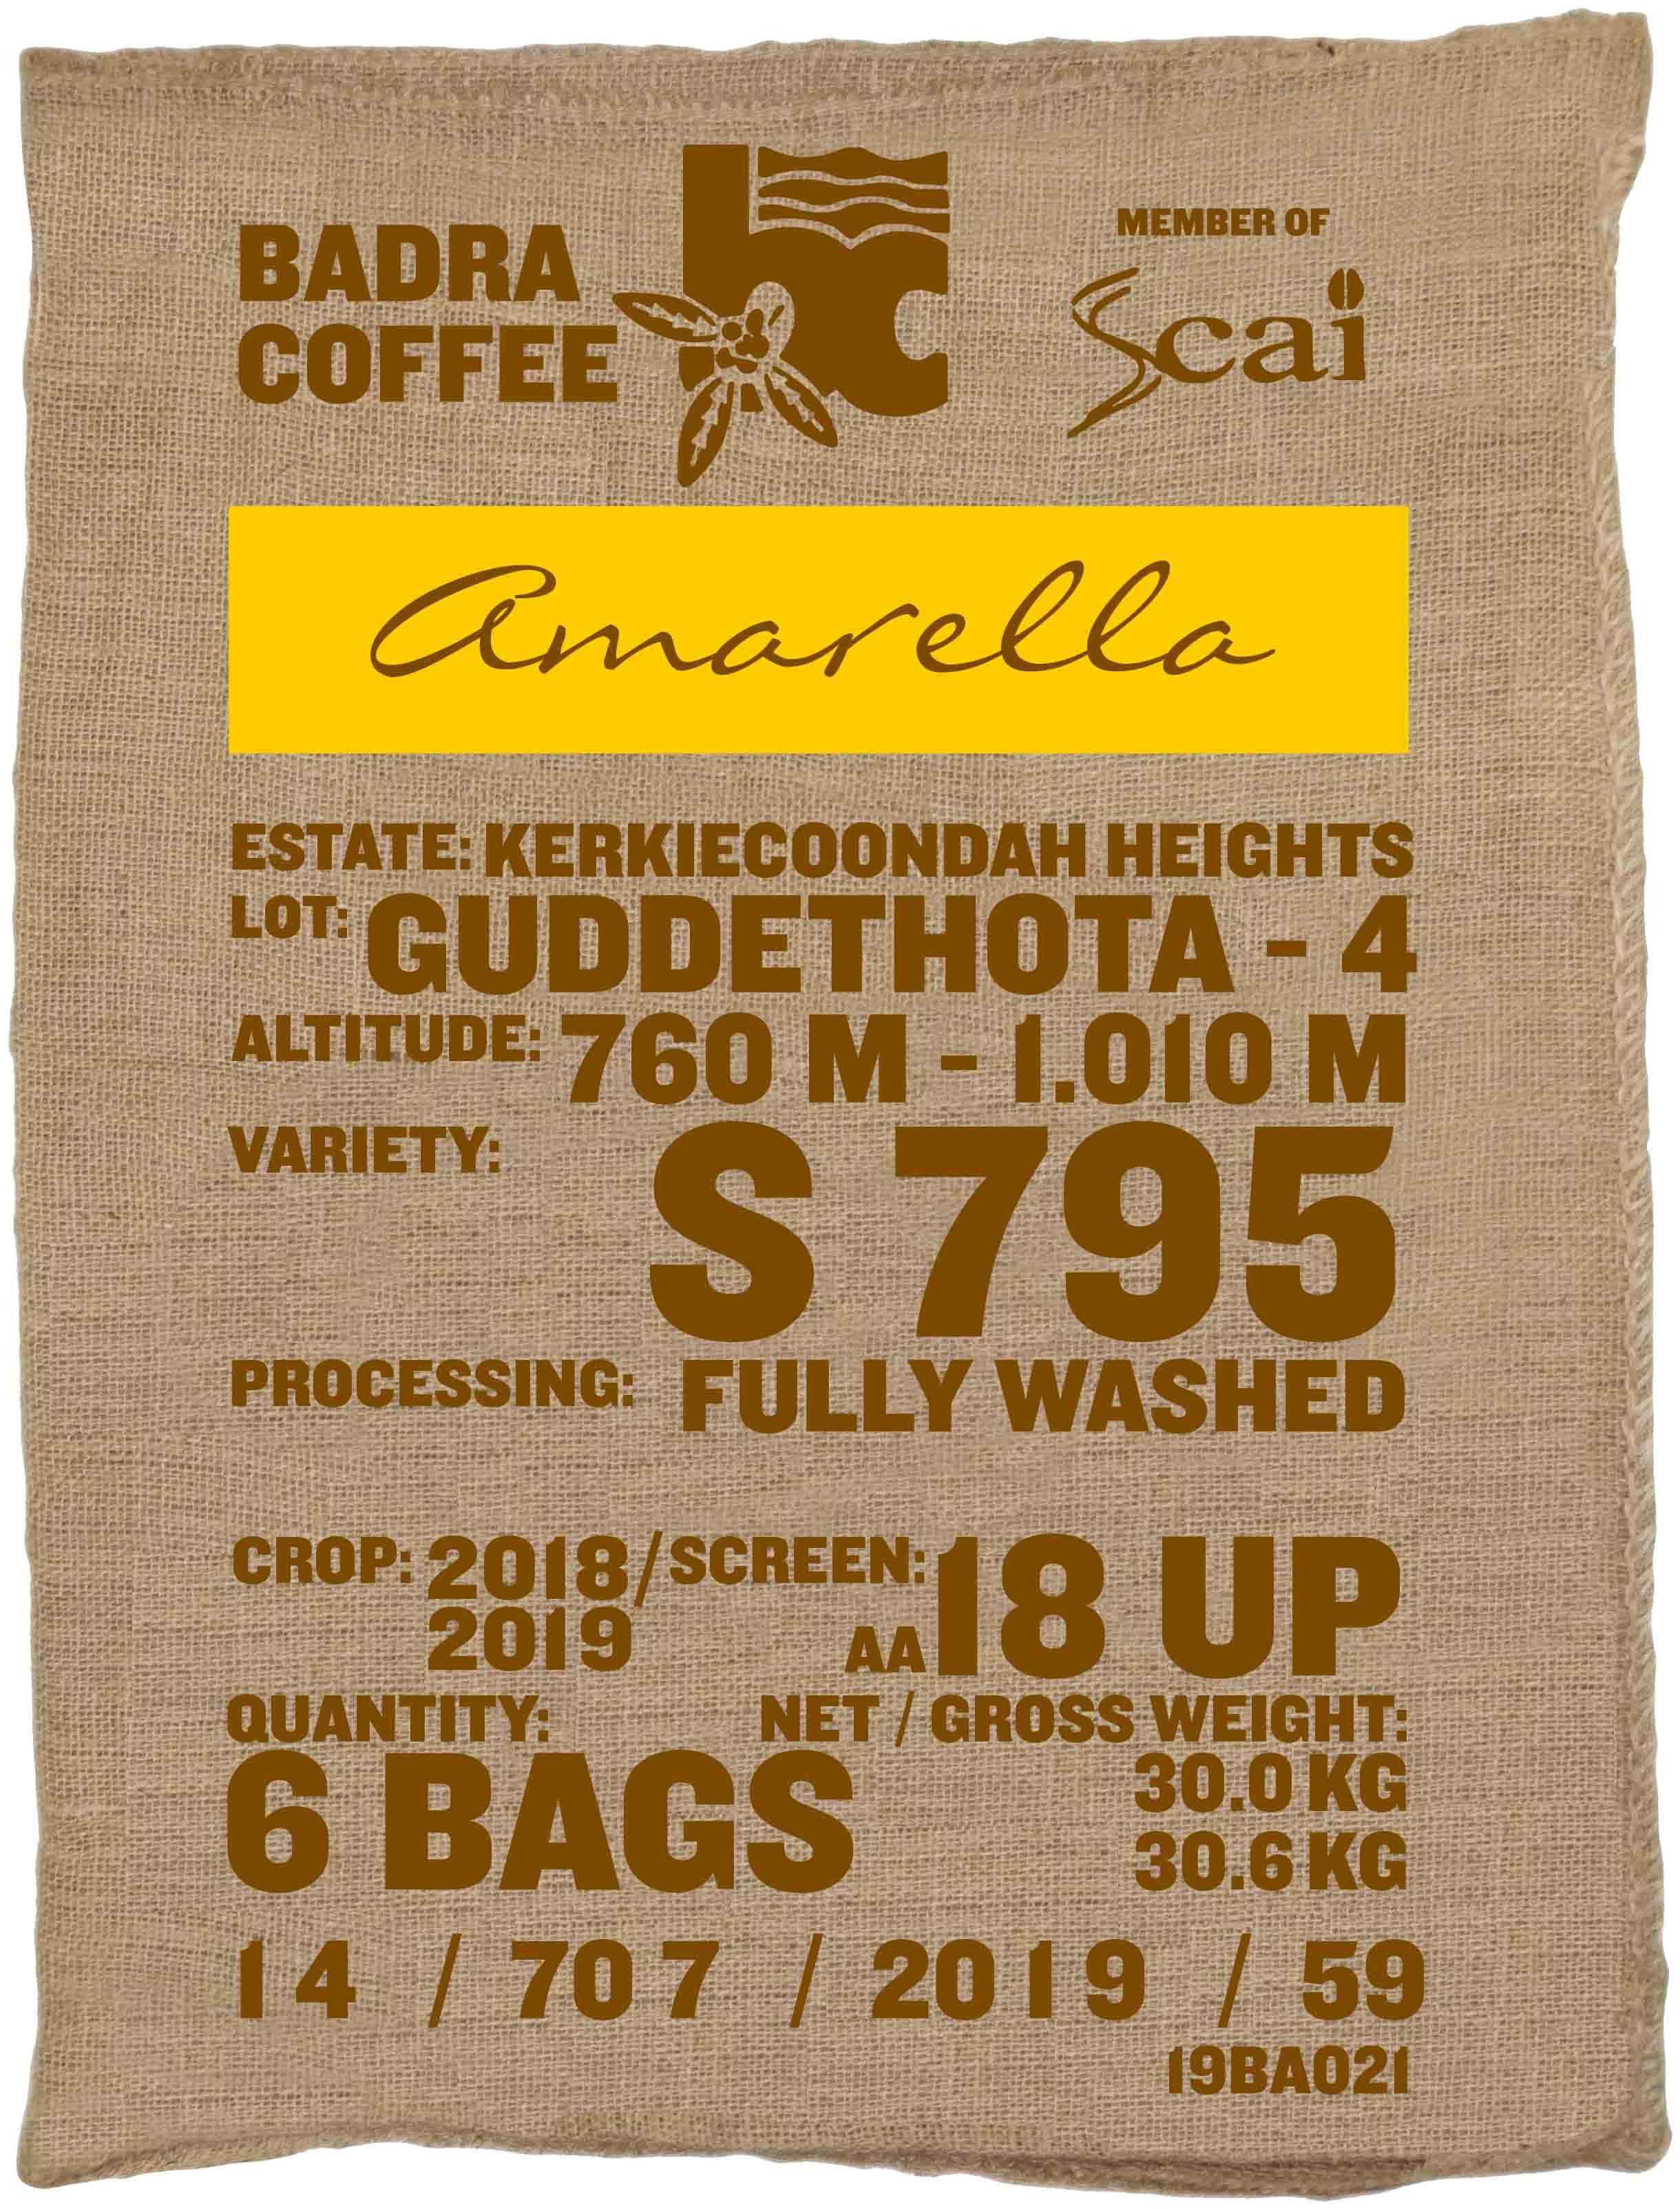 Ein Rohkaffeesack amarella Parzellenkaffee Varietät S795. Badra Estates Lot Guddethota 4.